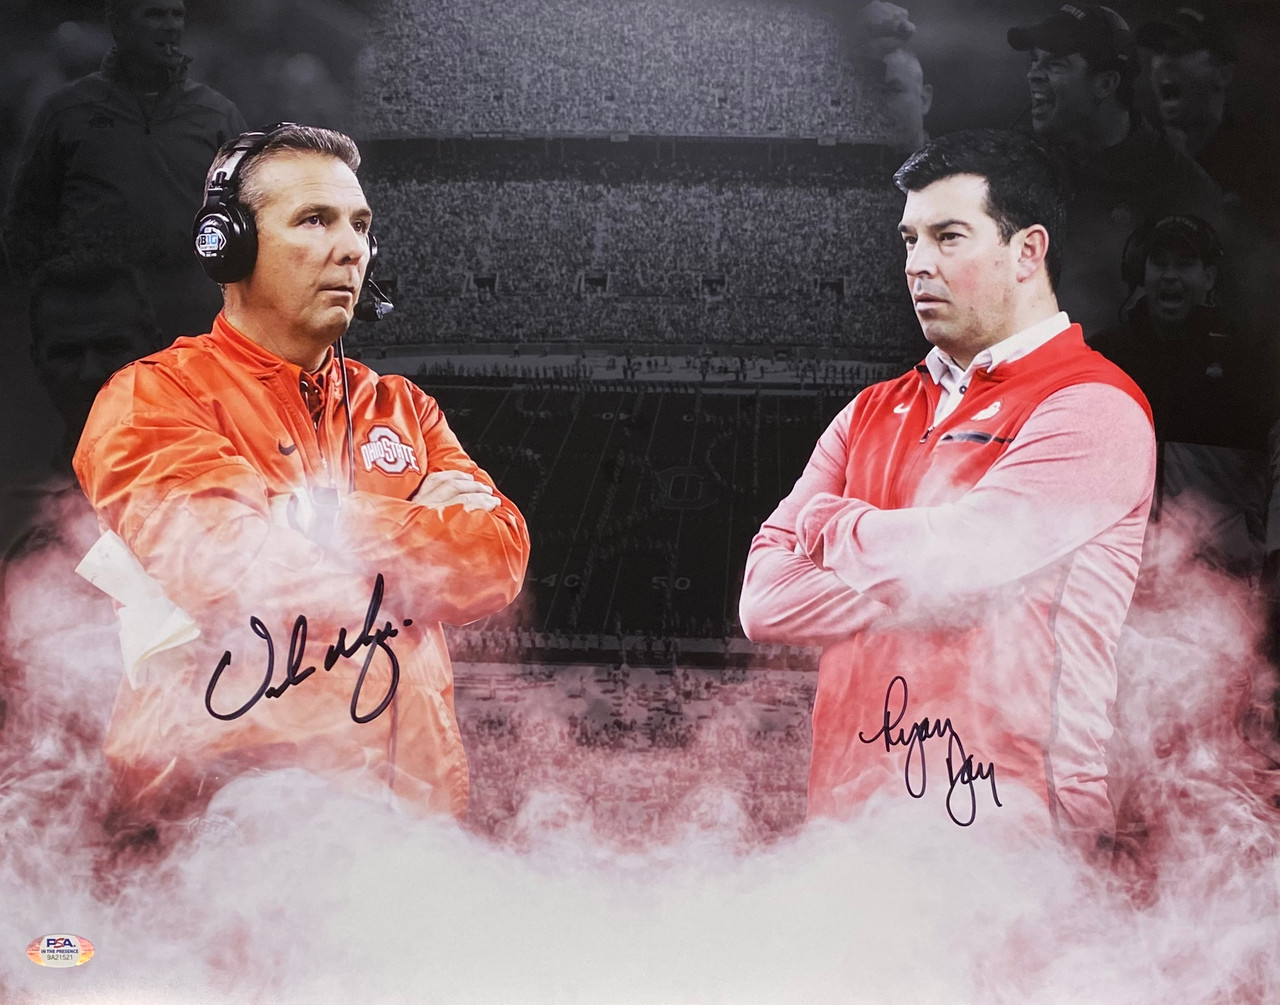 Urban Meyer & Ryan Day Ohio State Buckeyes 24-1 24x30 Autographed Photo - PSA Authentic